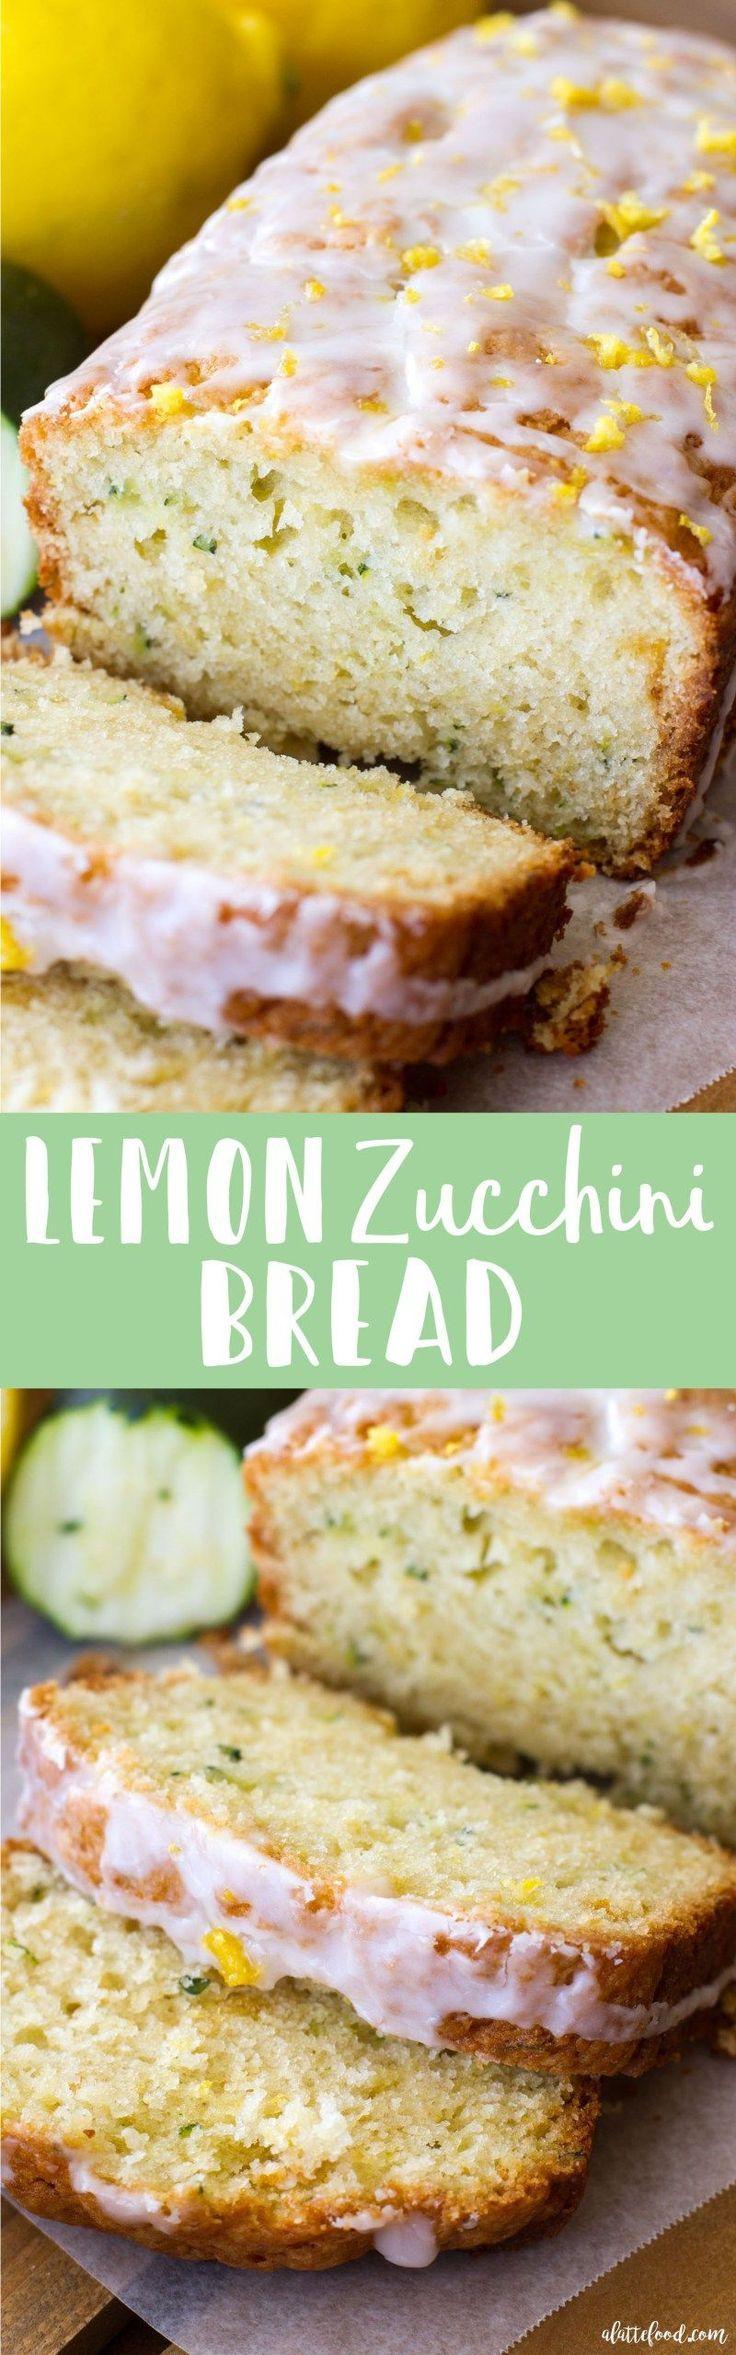 This easy zucchini bread recipe has a lemon bread twist to it making it the per